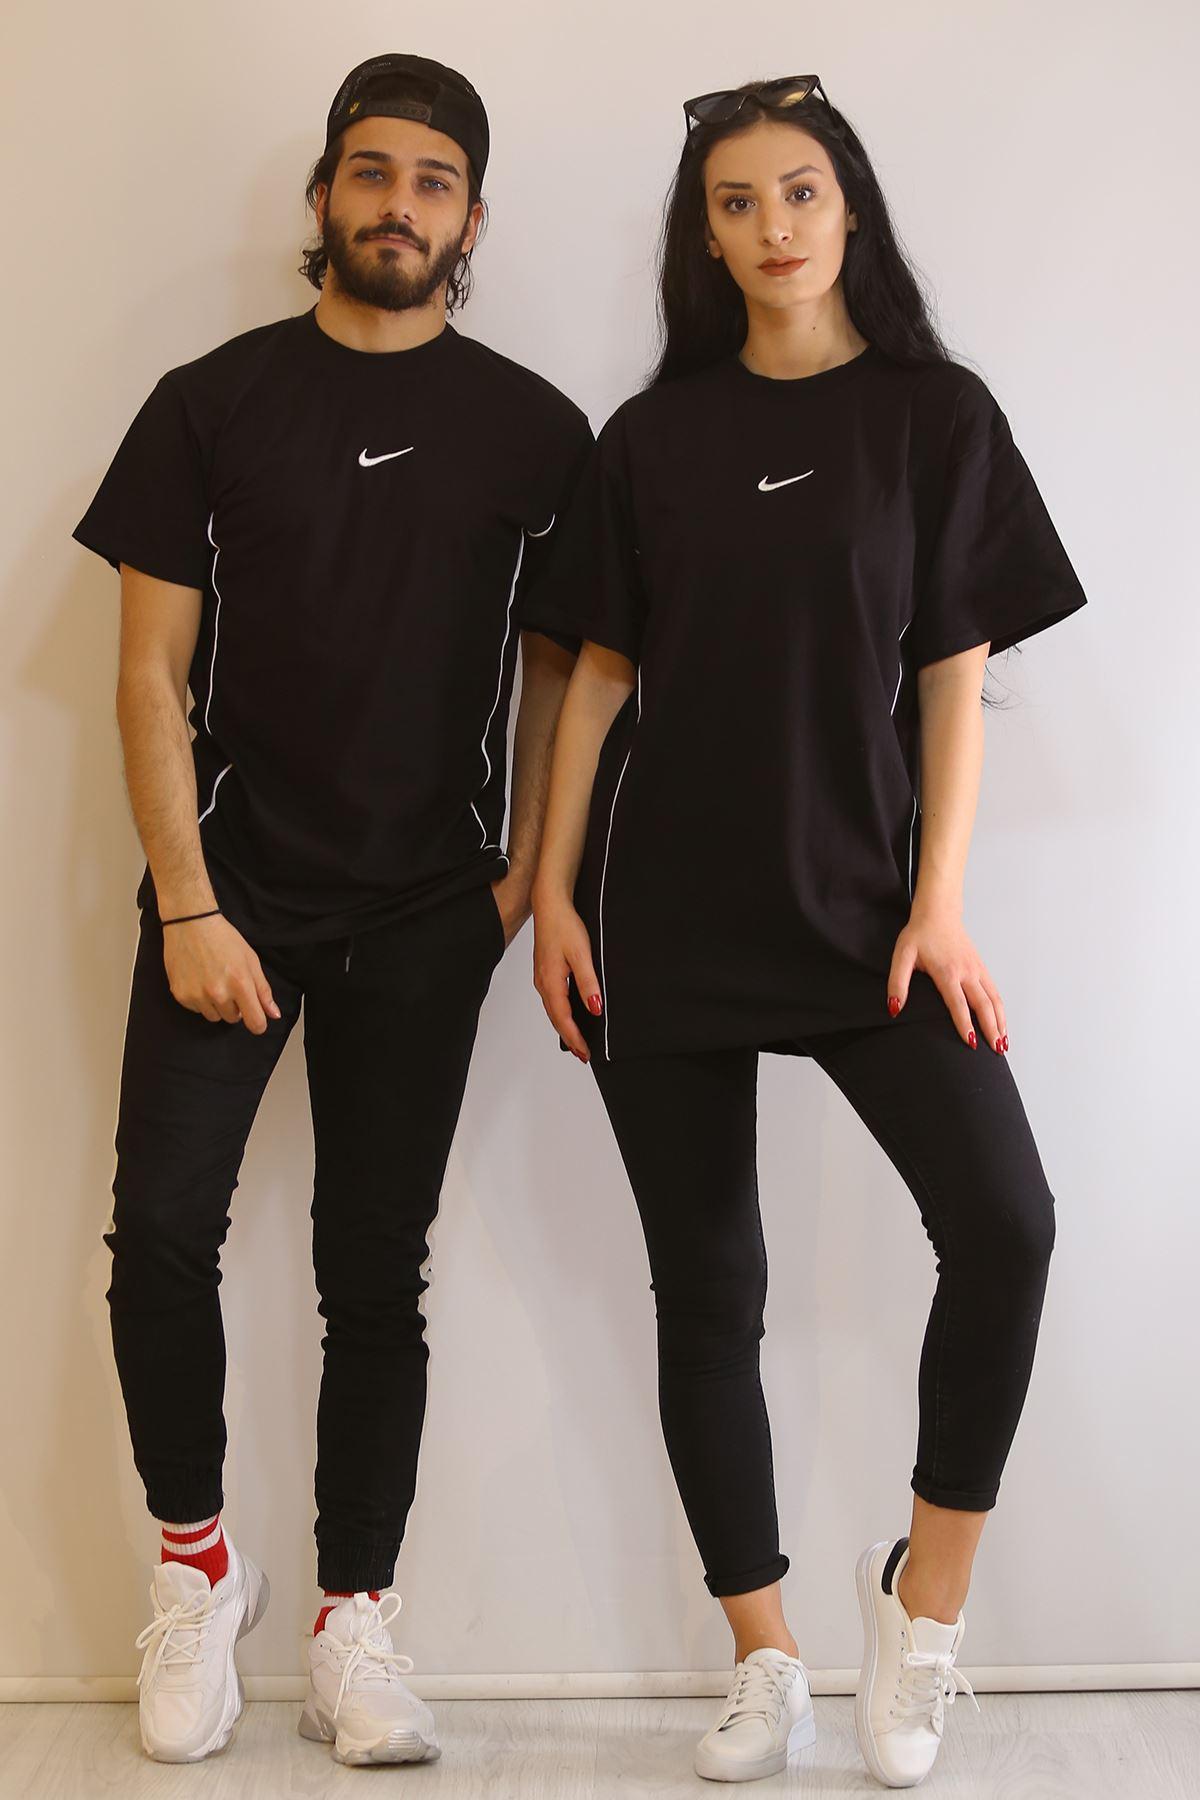 Biyeli Tişört Siyah - 6056.1377.